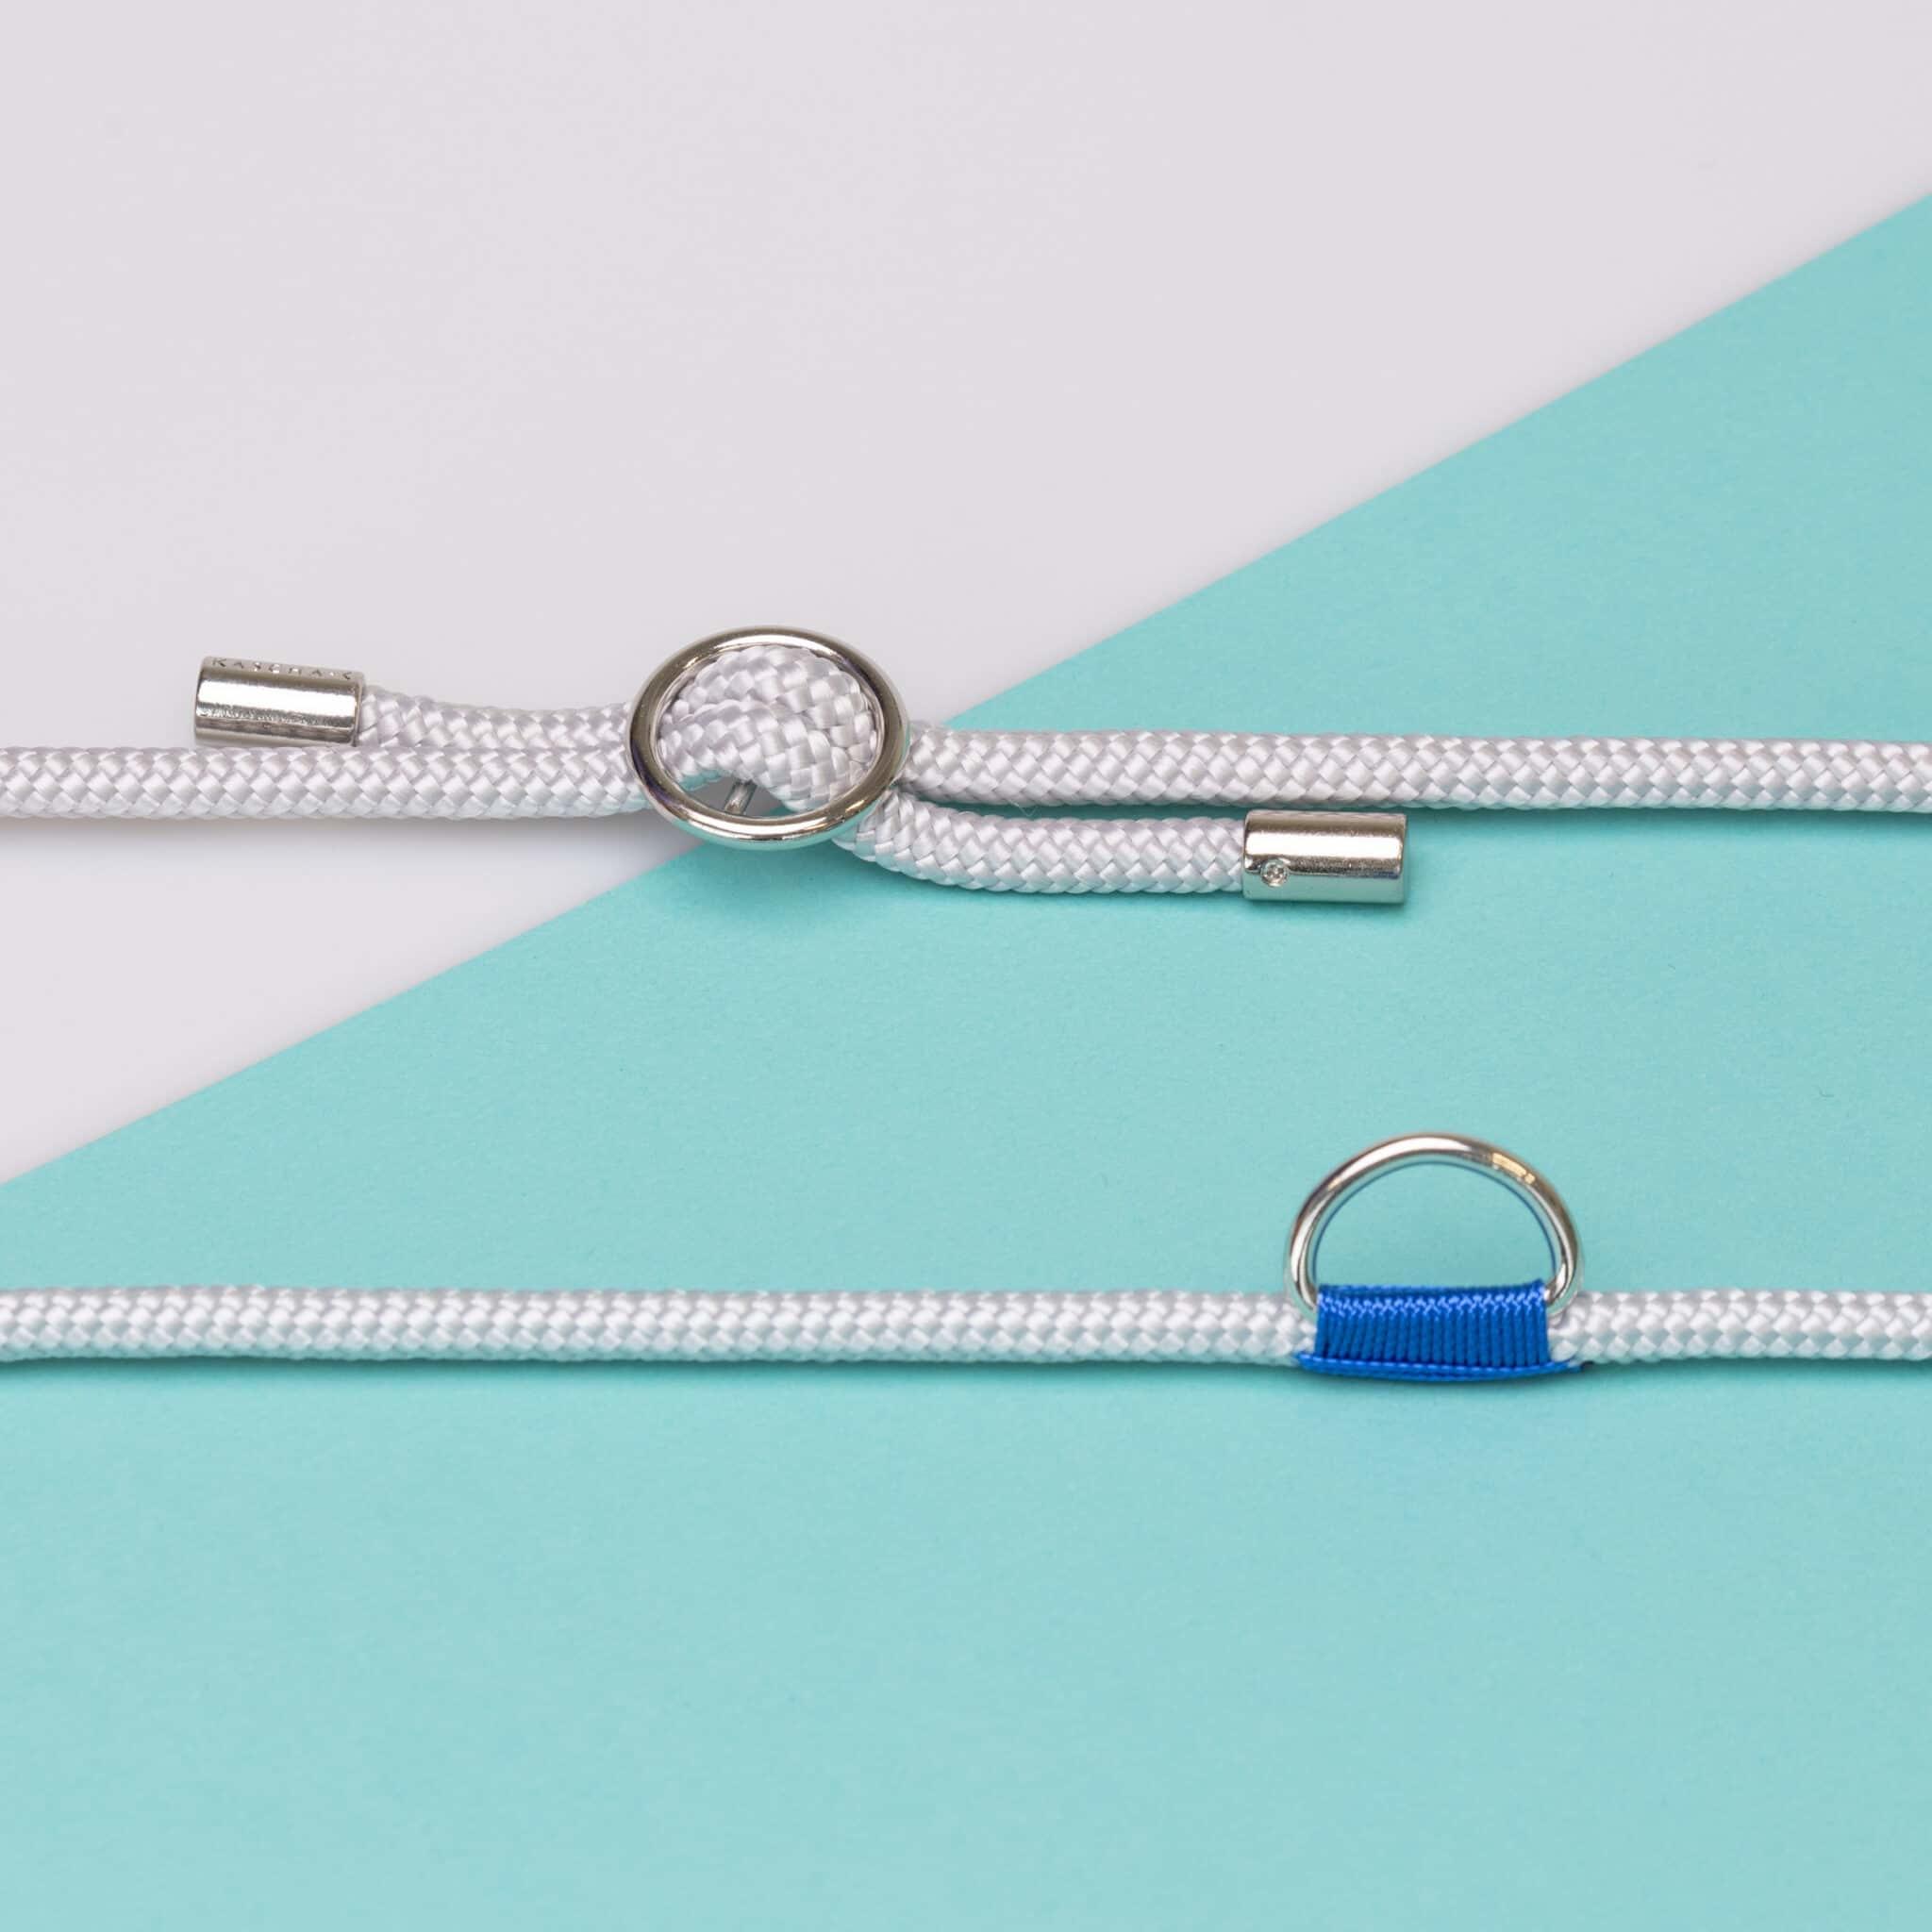 Kascha-C Basic cord 1.5 M - silver Grey